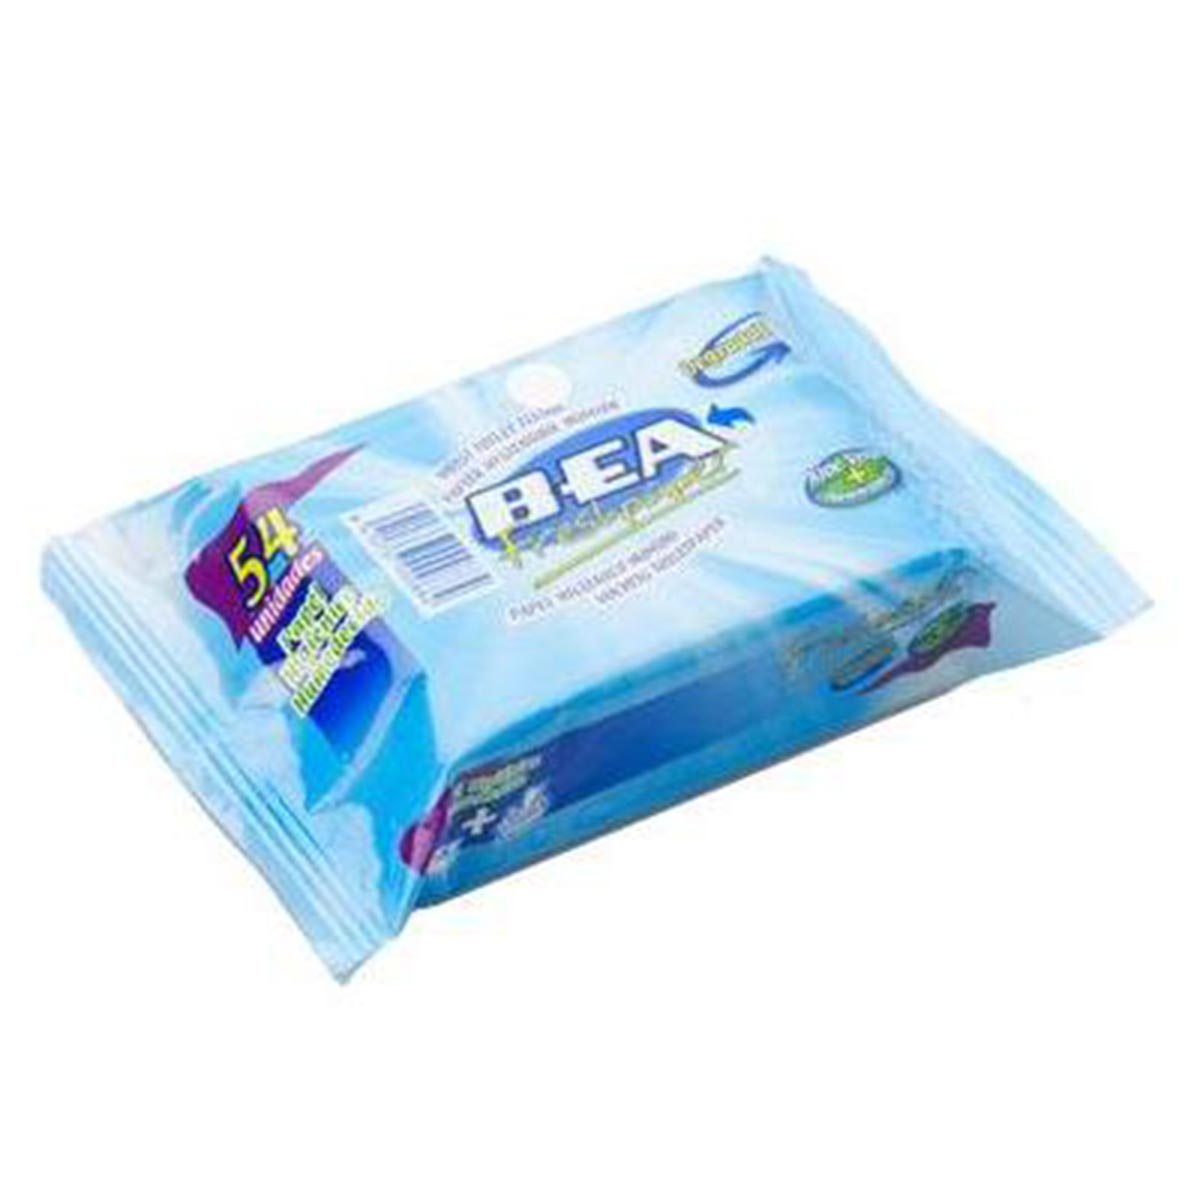 Lea Bea Fresh Family Pack Wet Wipes 54 Unites